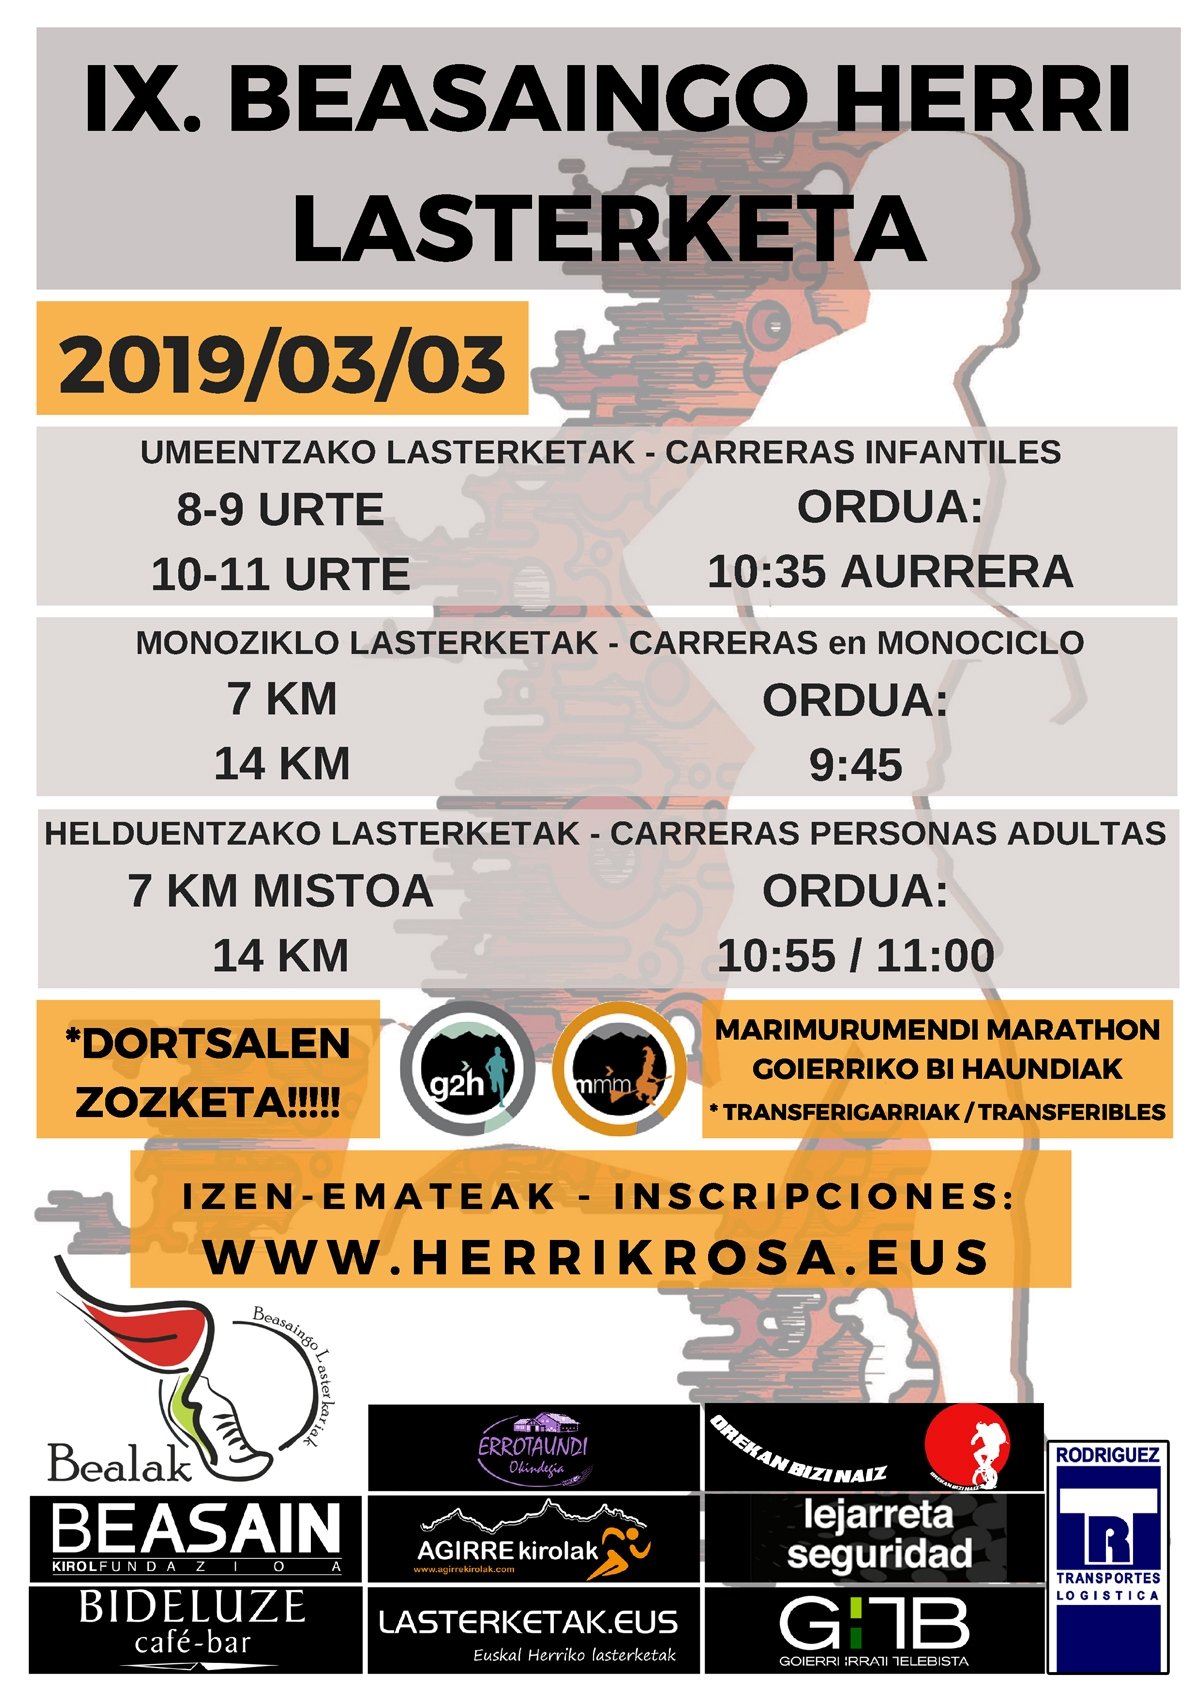 20190303_Beasaingo-Herri-Lasterketa-v3-2.jpg